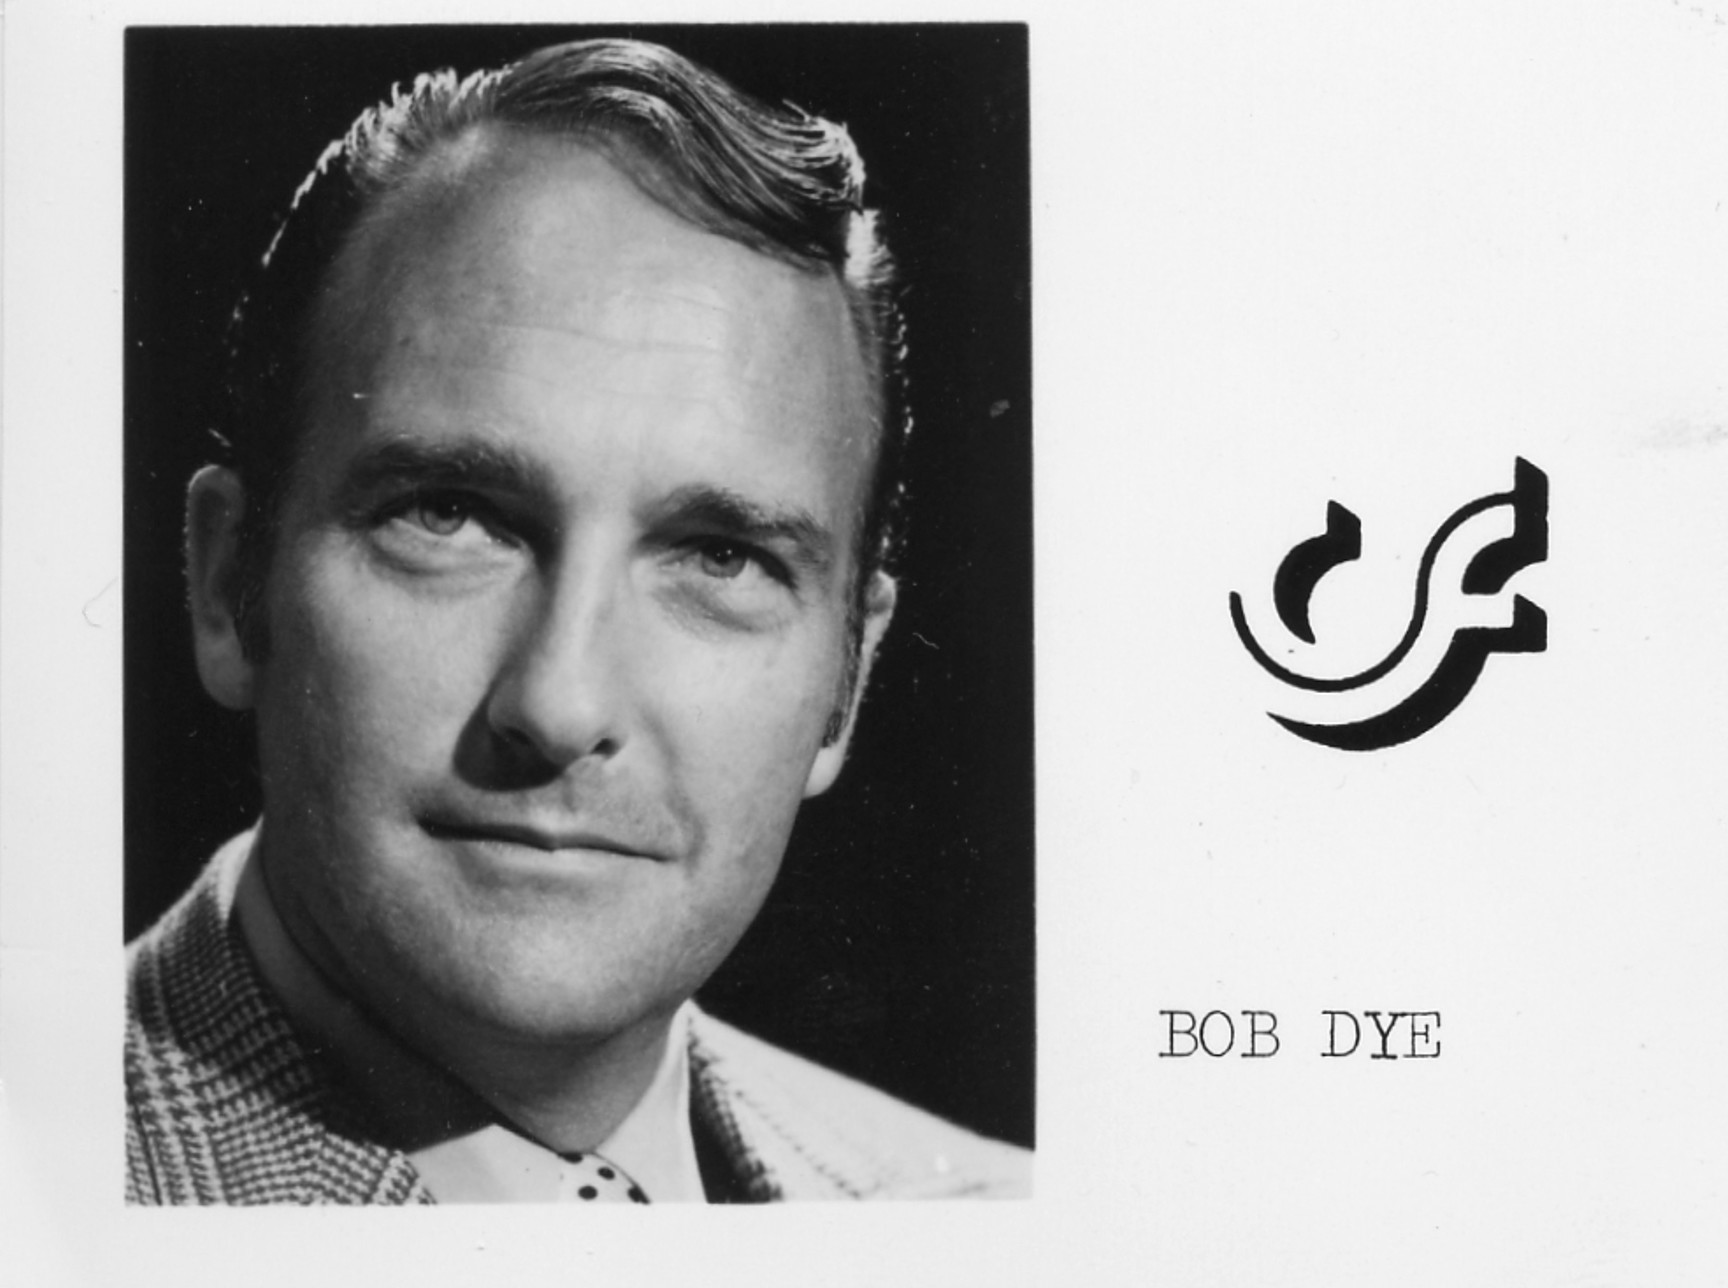 Former Cal State Fullerton's head coach Bob Dye.